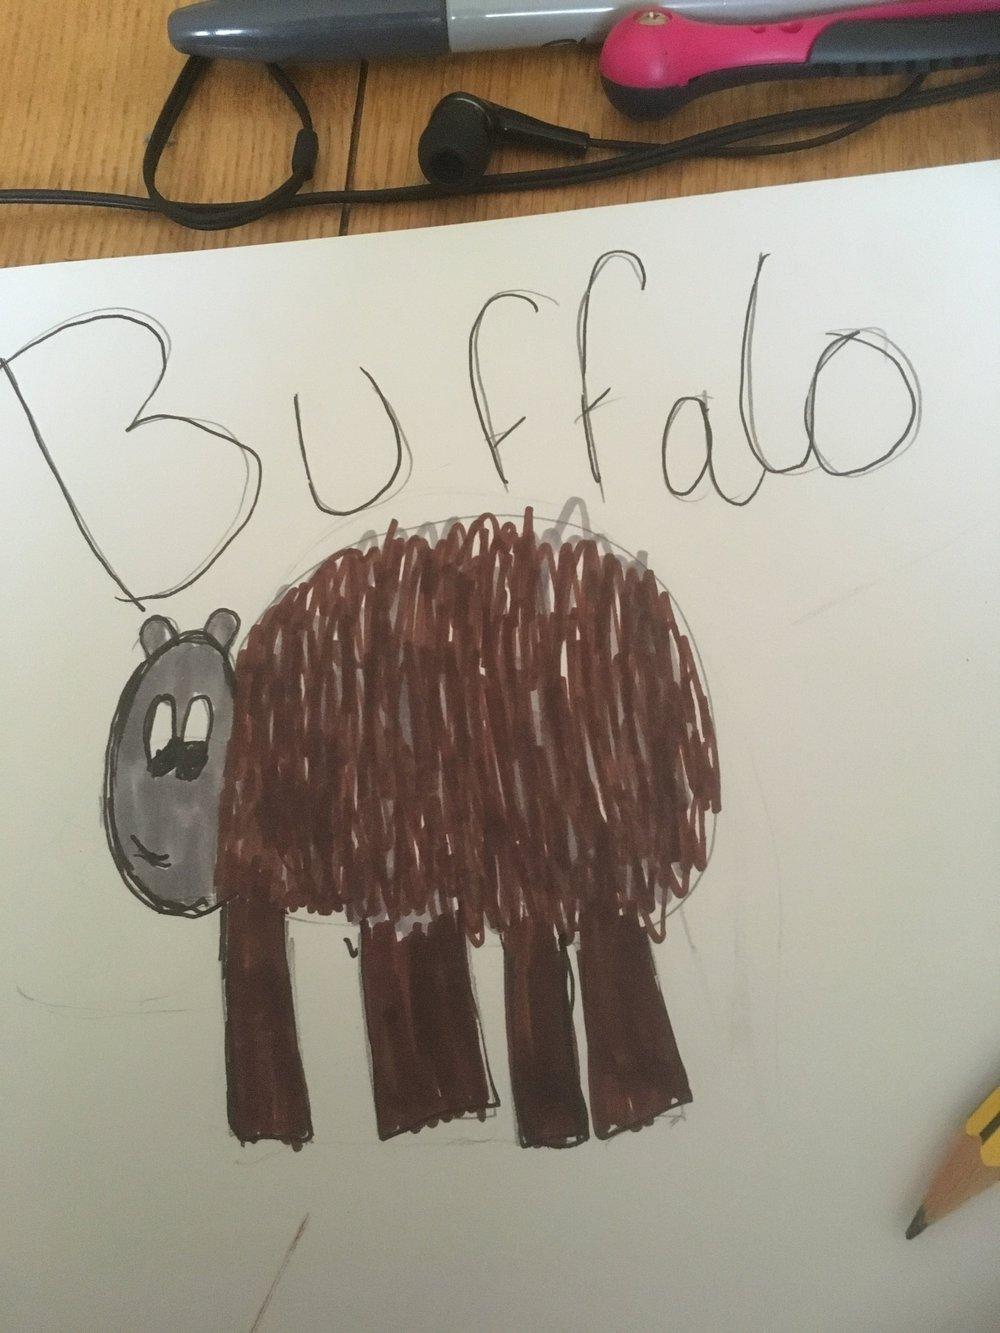 'Buffalo' by Katie Goodall